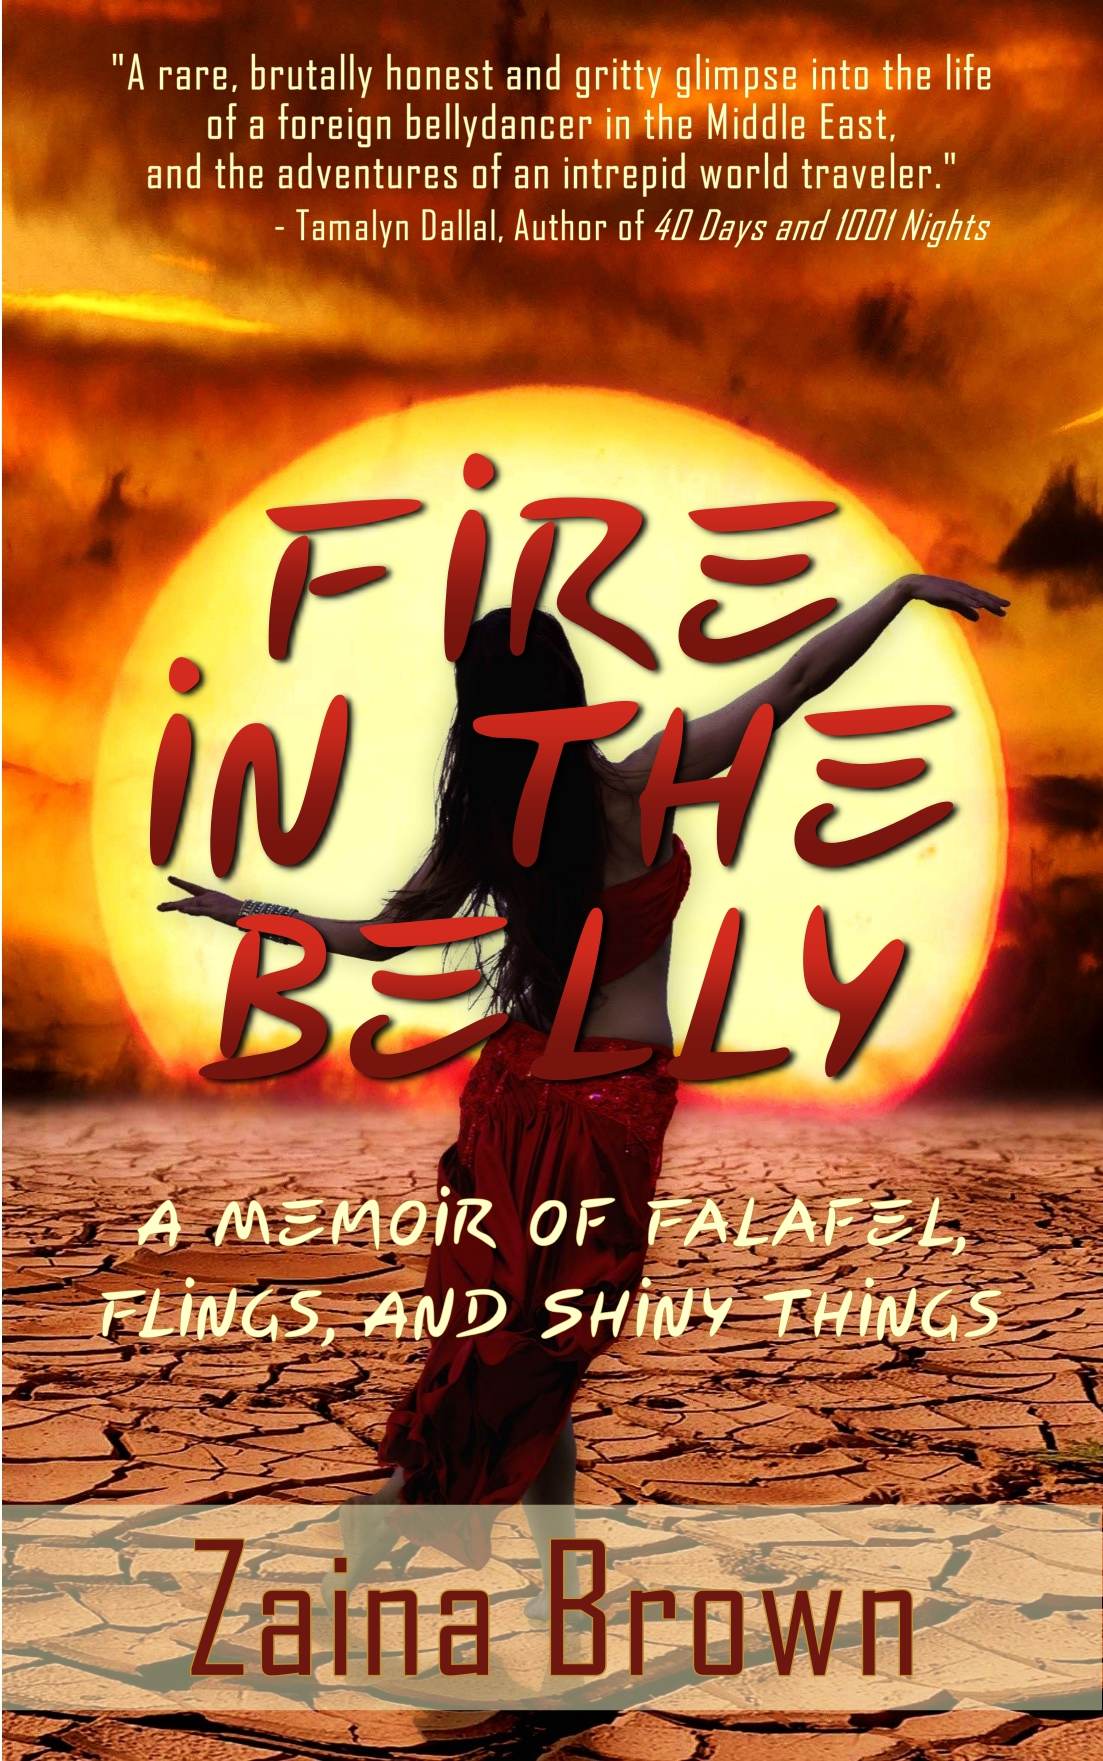 belly dance book